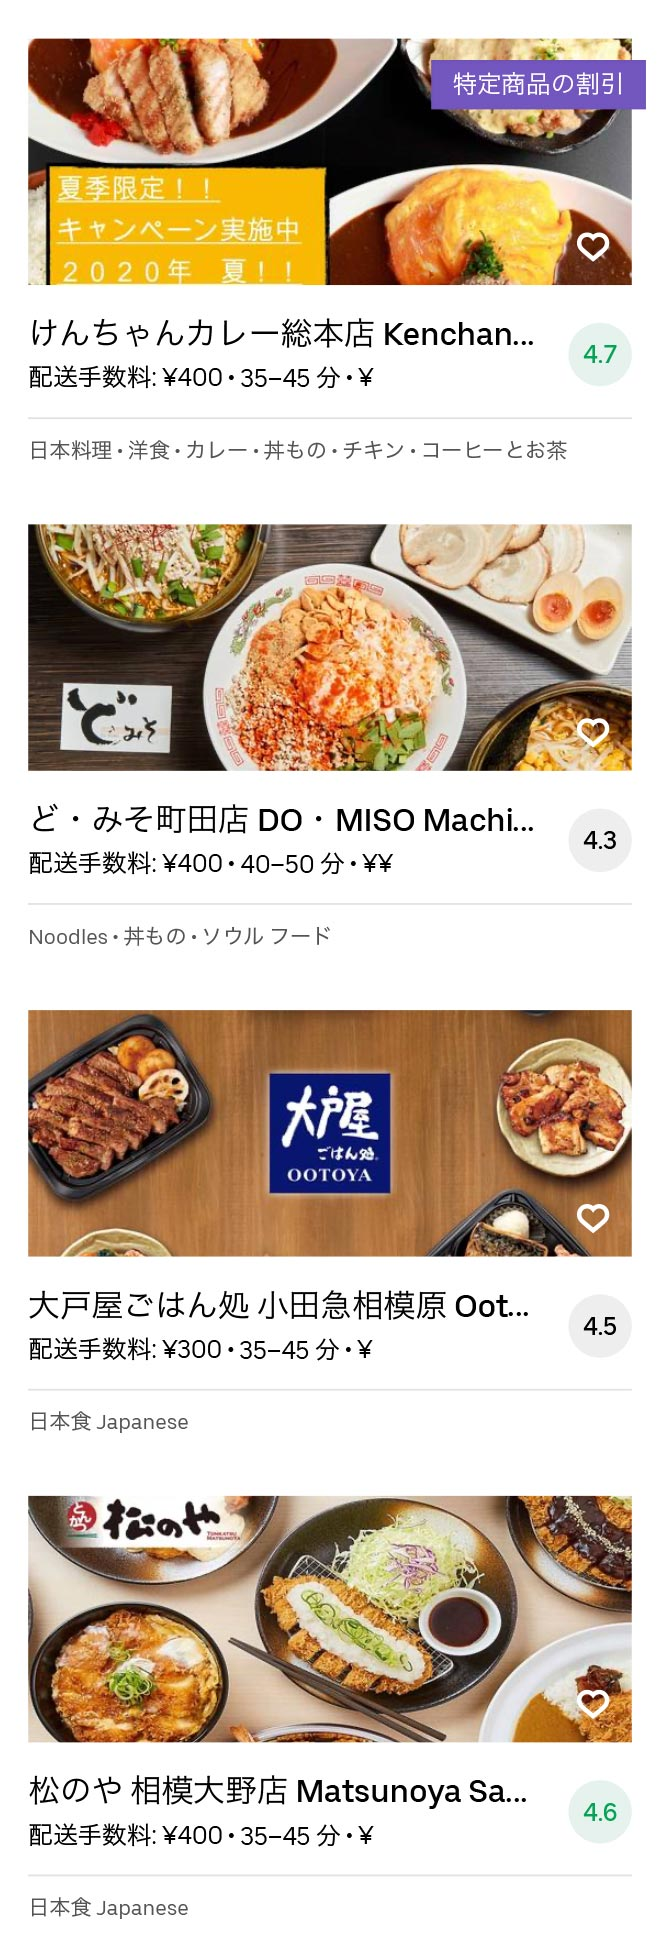 Chuo rinkan menu 2008 08